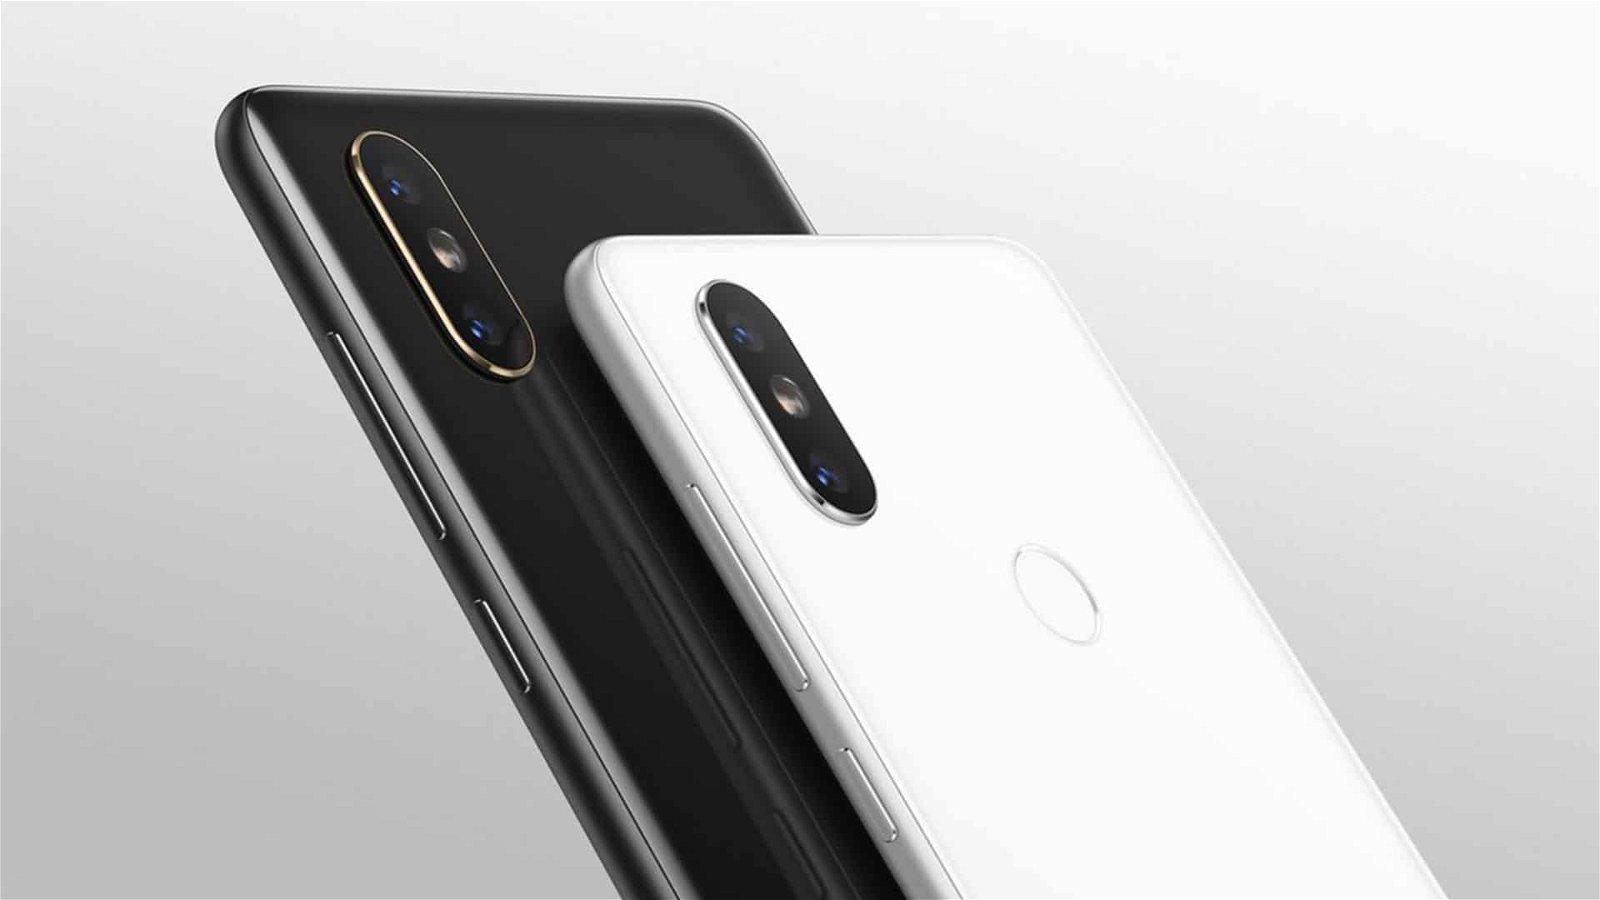 Xiaomi Mi Mix 2S (Smartphone) Review